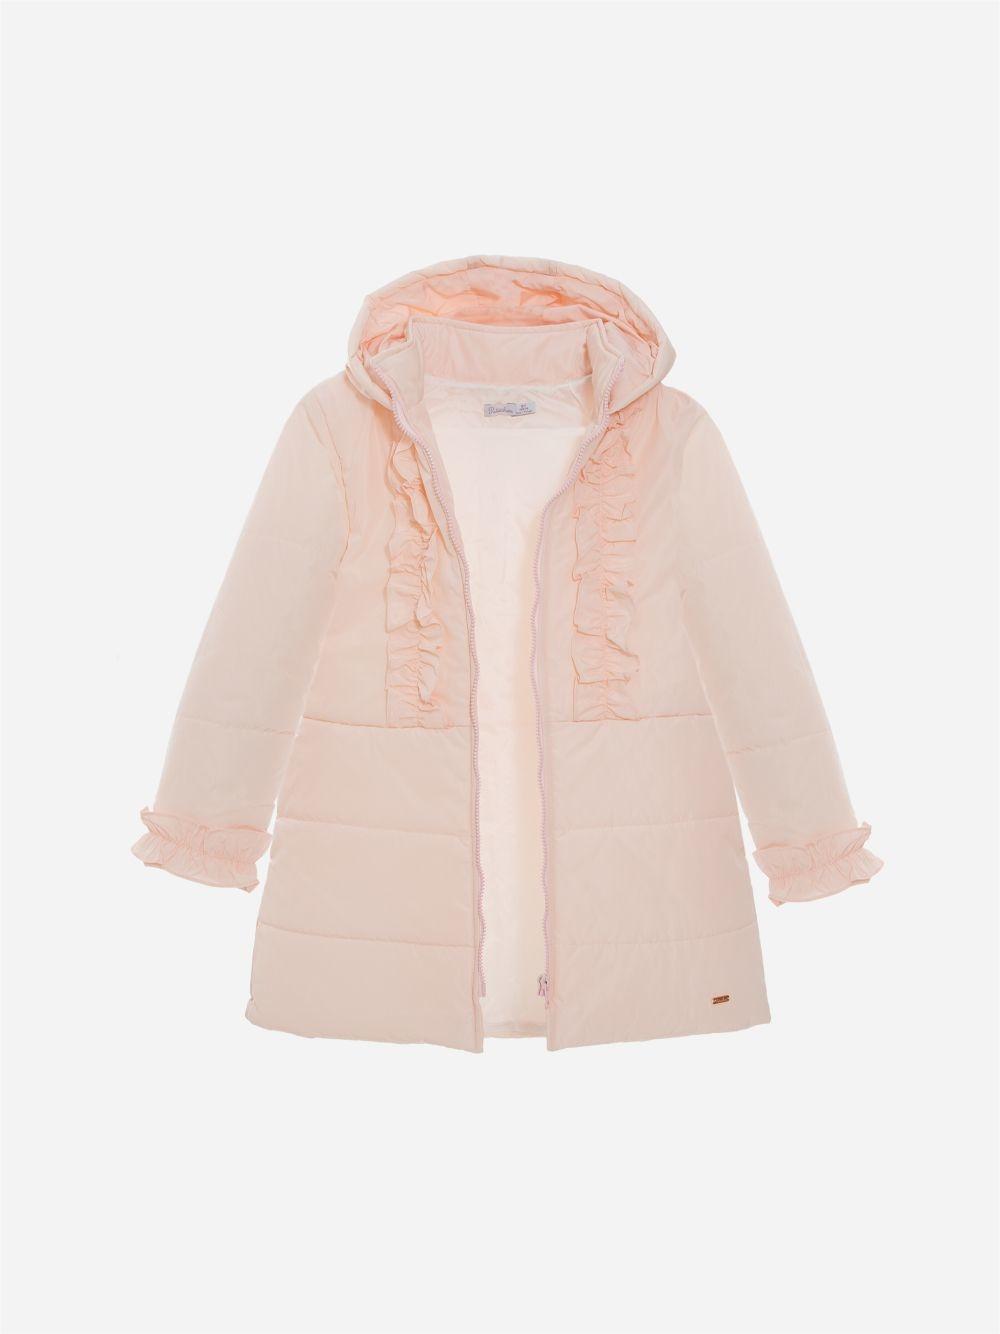 Patachou Patachou Girls Frill Coat